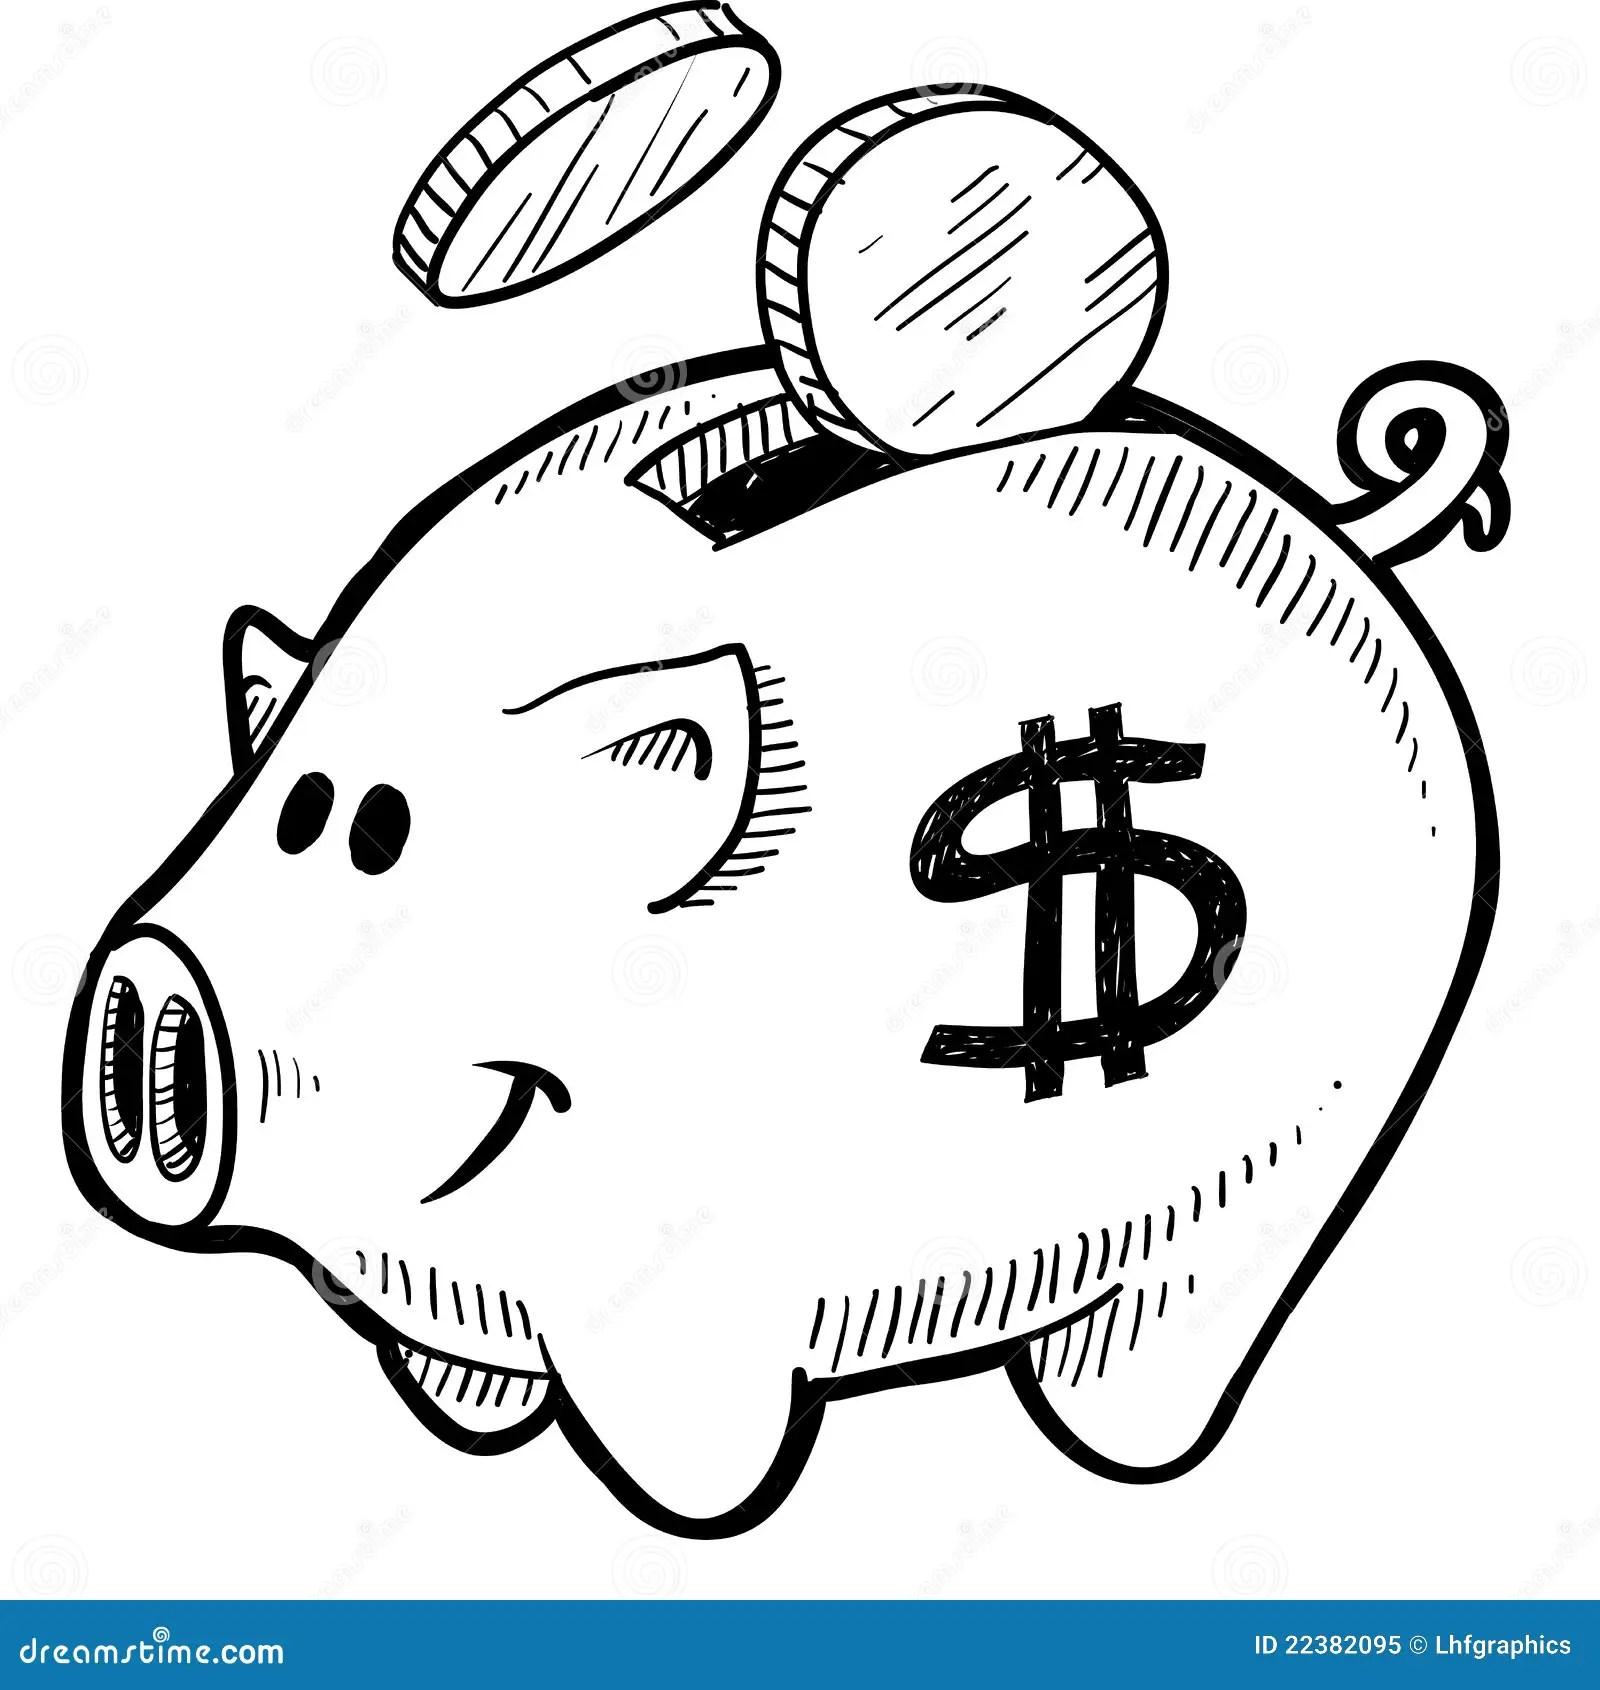 Piggy Bank Sketch Royalty Free Stock Photo